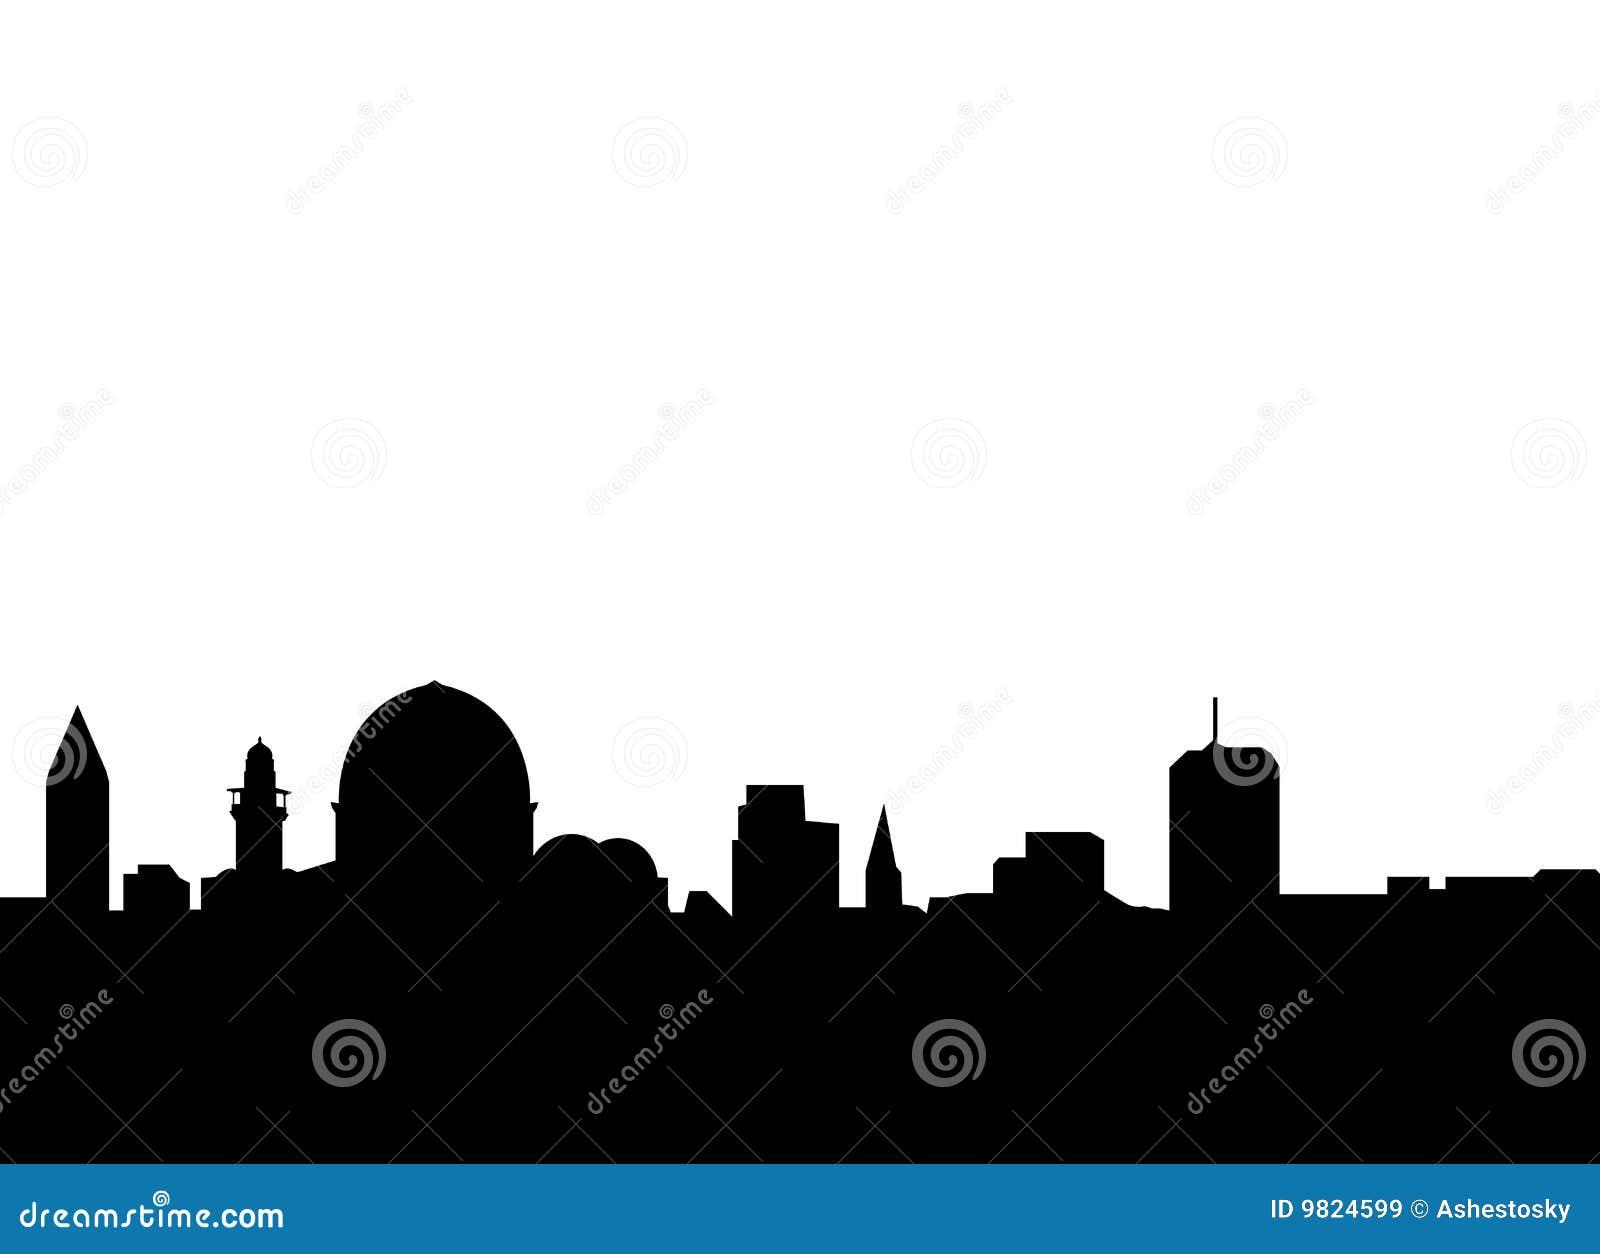 Royalty Free Stock Images Jerusalem Skyline Vector Image9824599